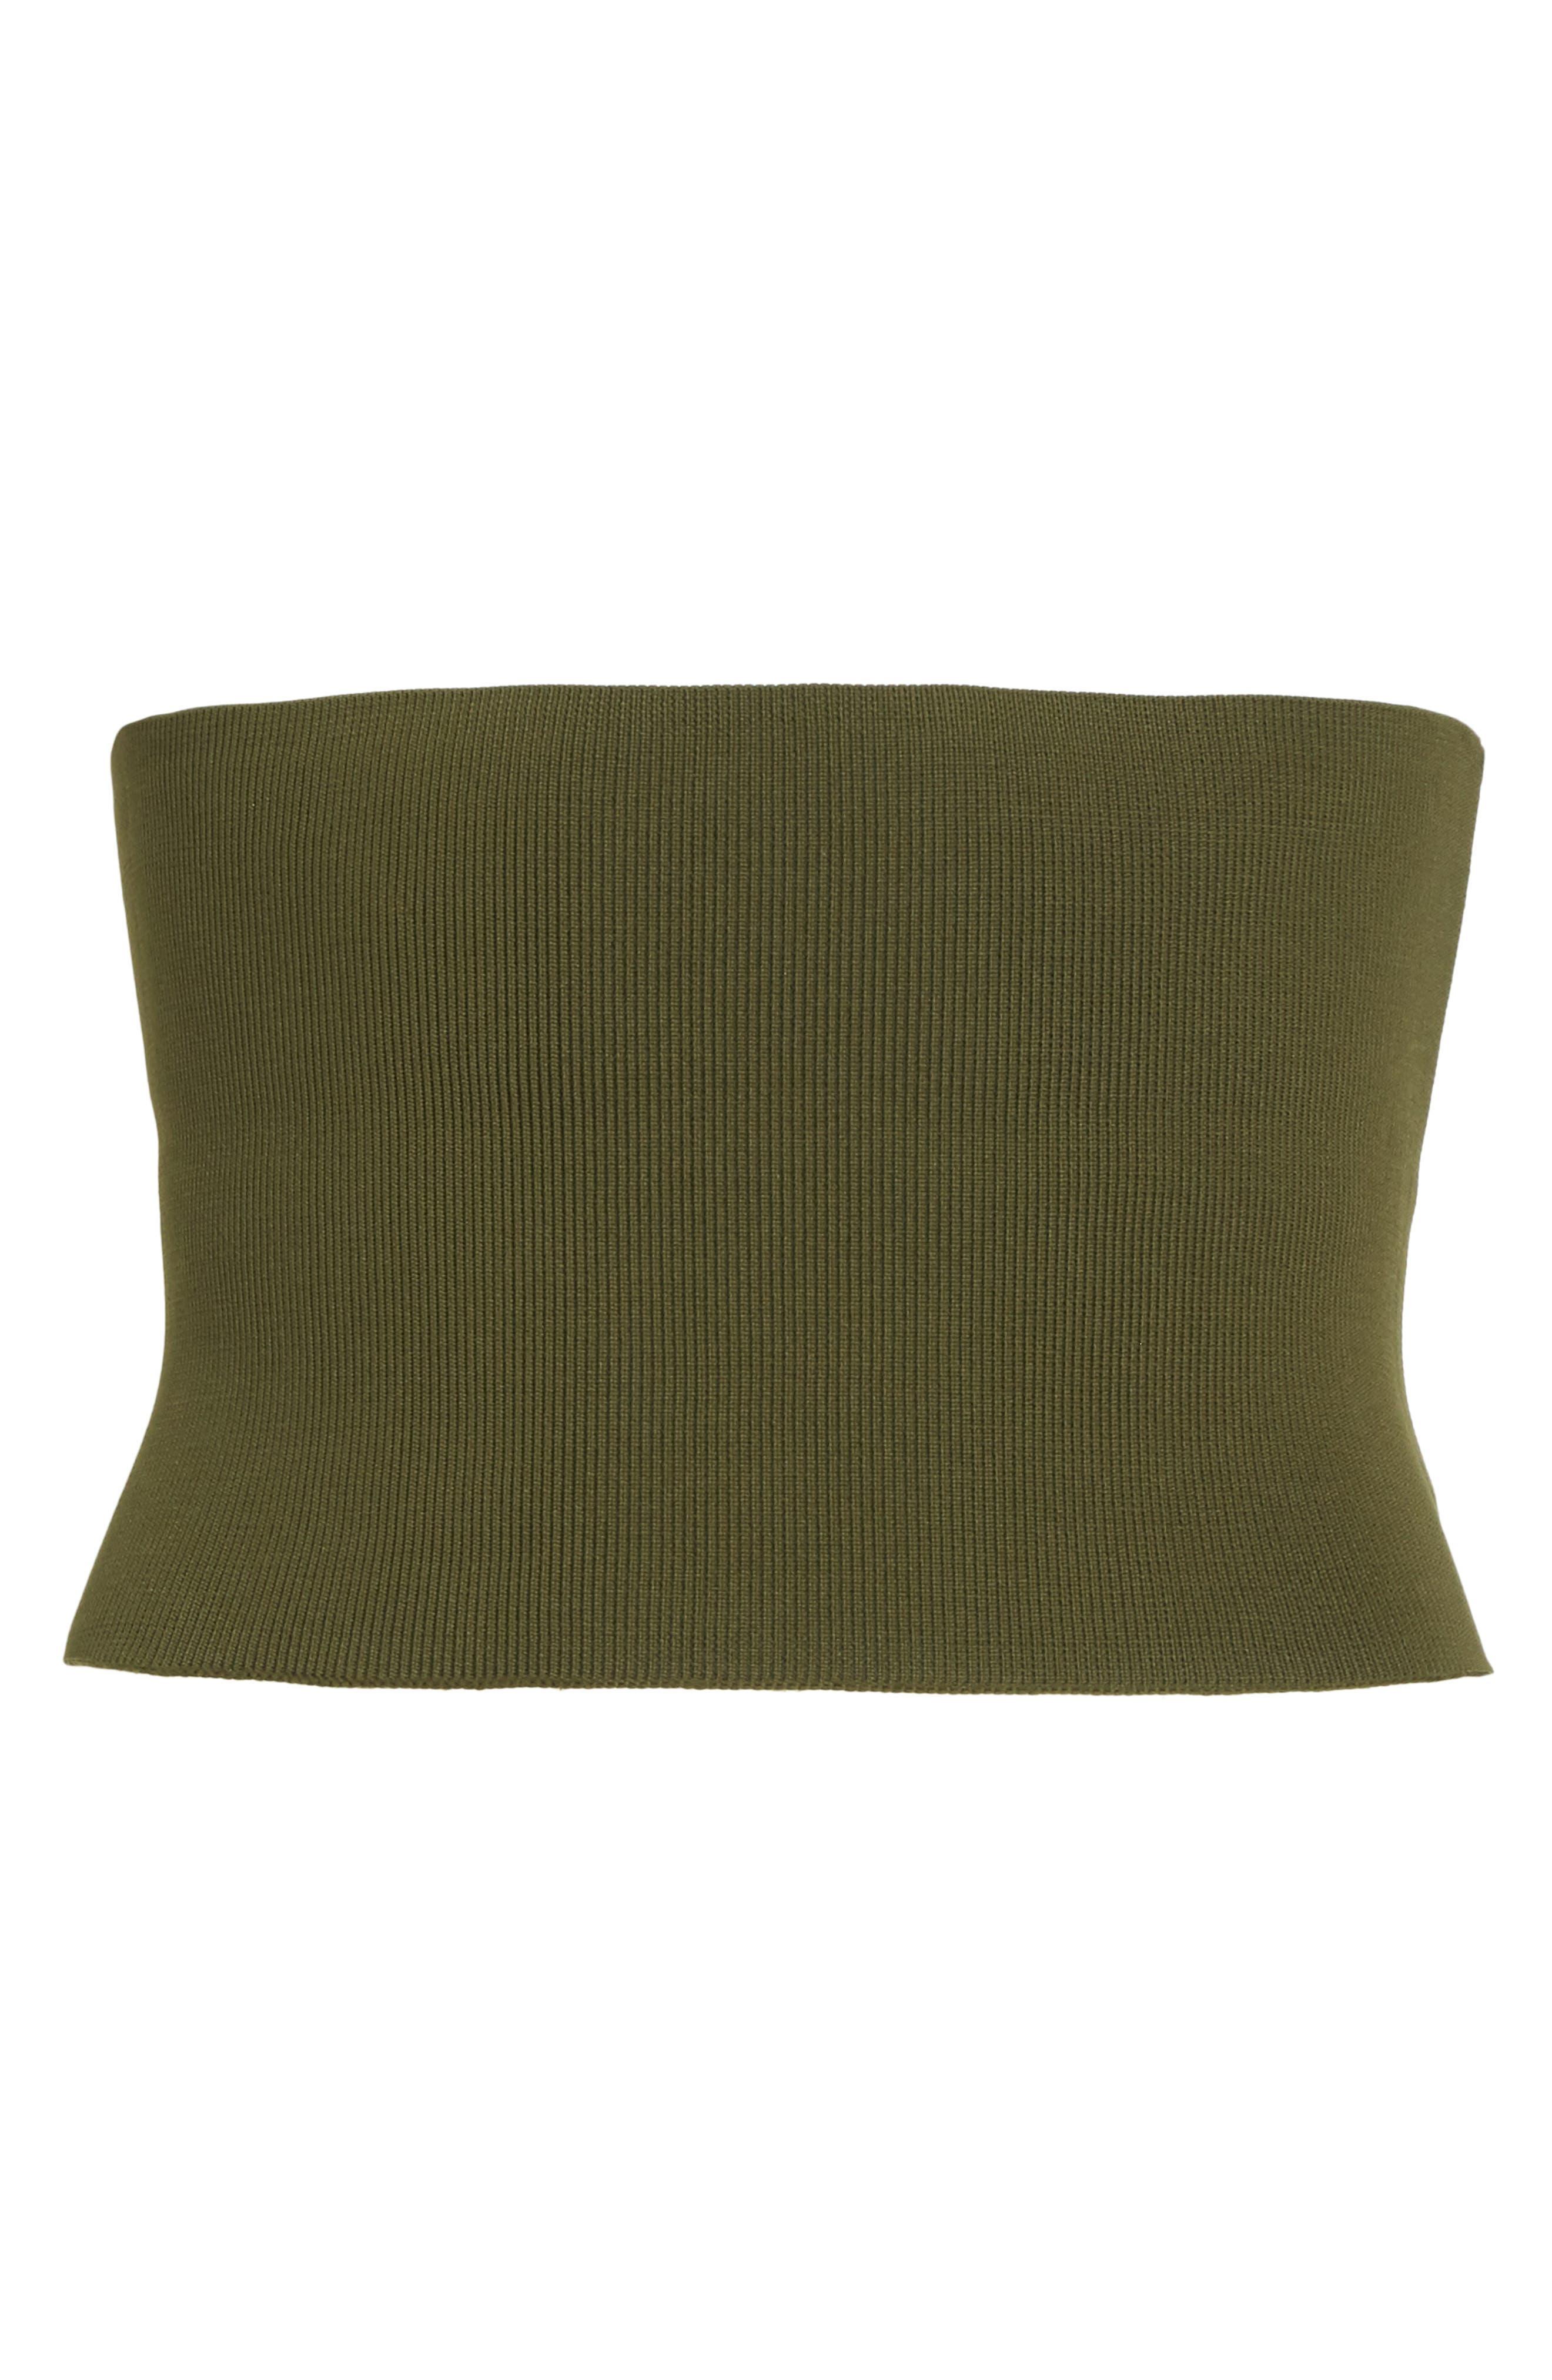 Lace-Up Knit Corset,                             Alternate thumbnail 6, color,                             Loden